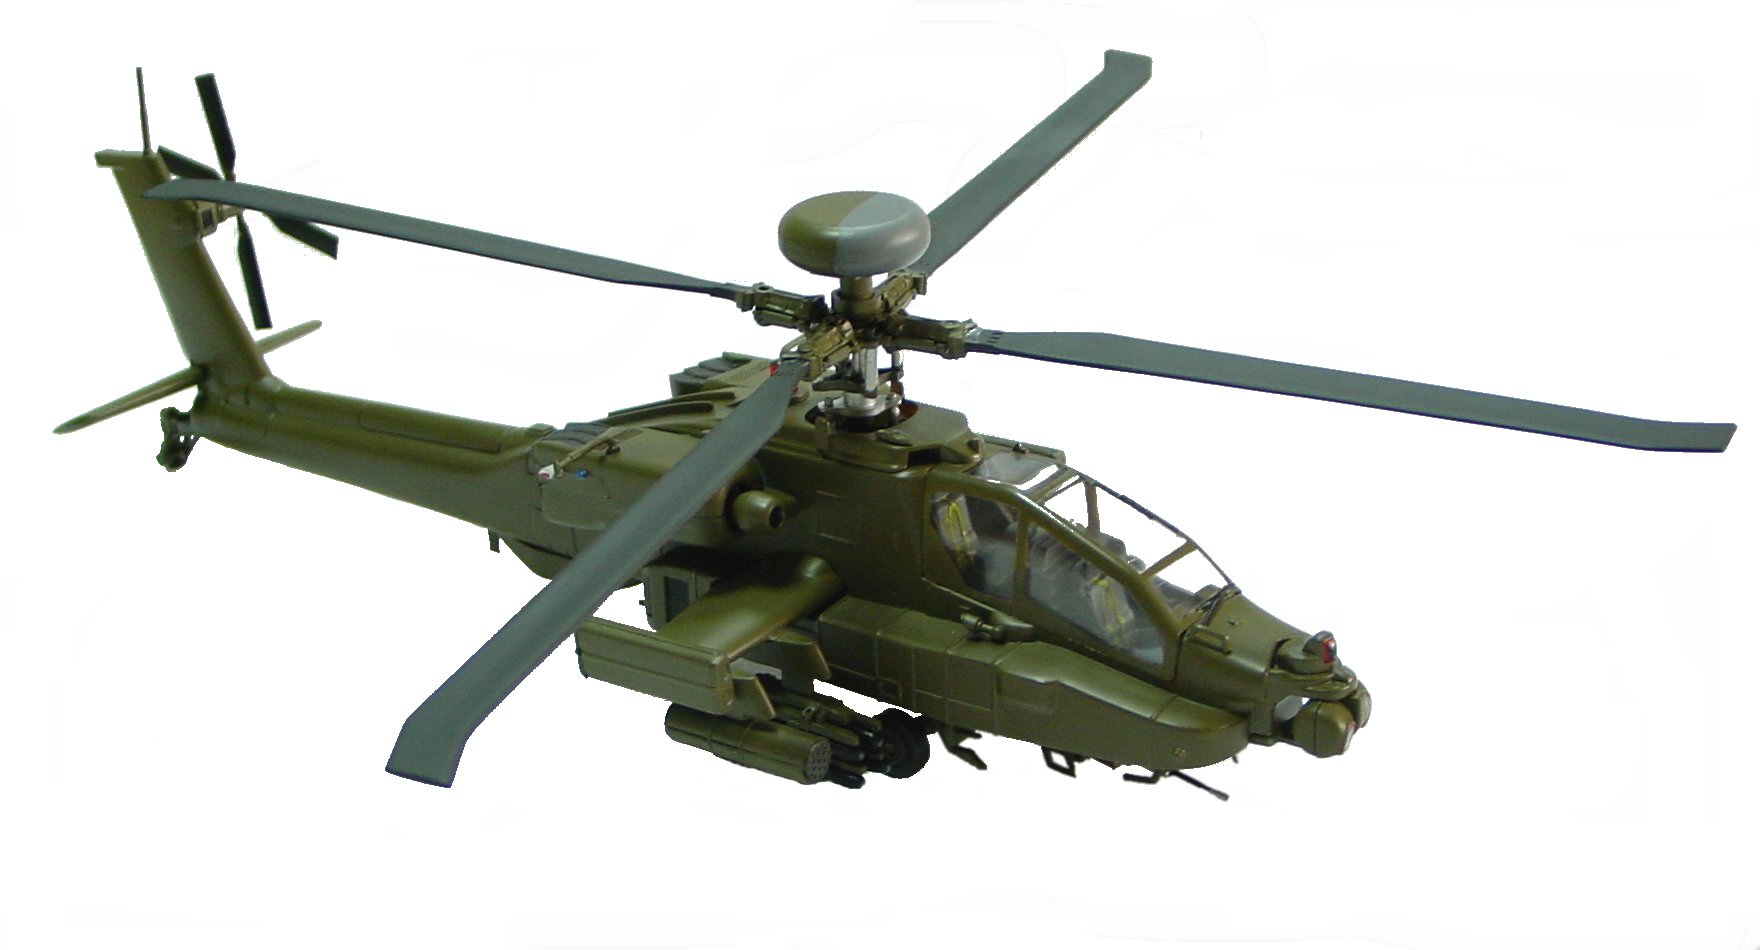 Ah-64 Apache, вертолет, обои, фото, фотографии вретолетов